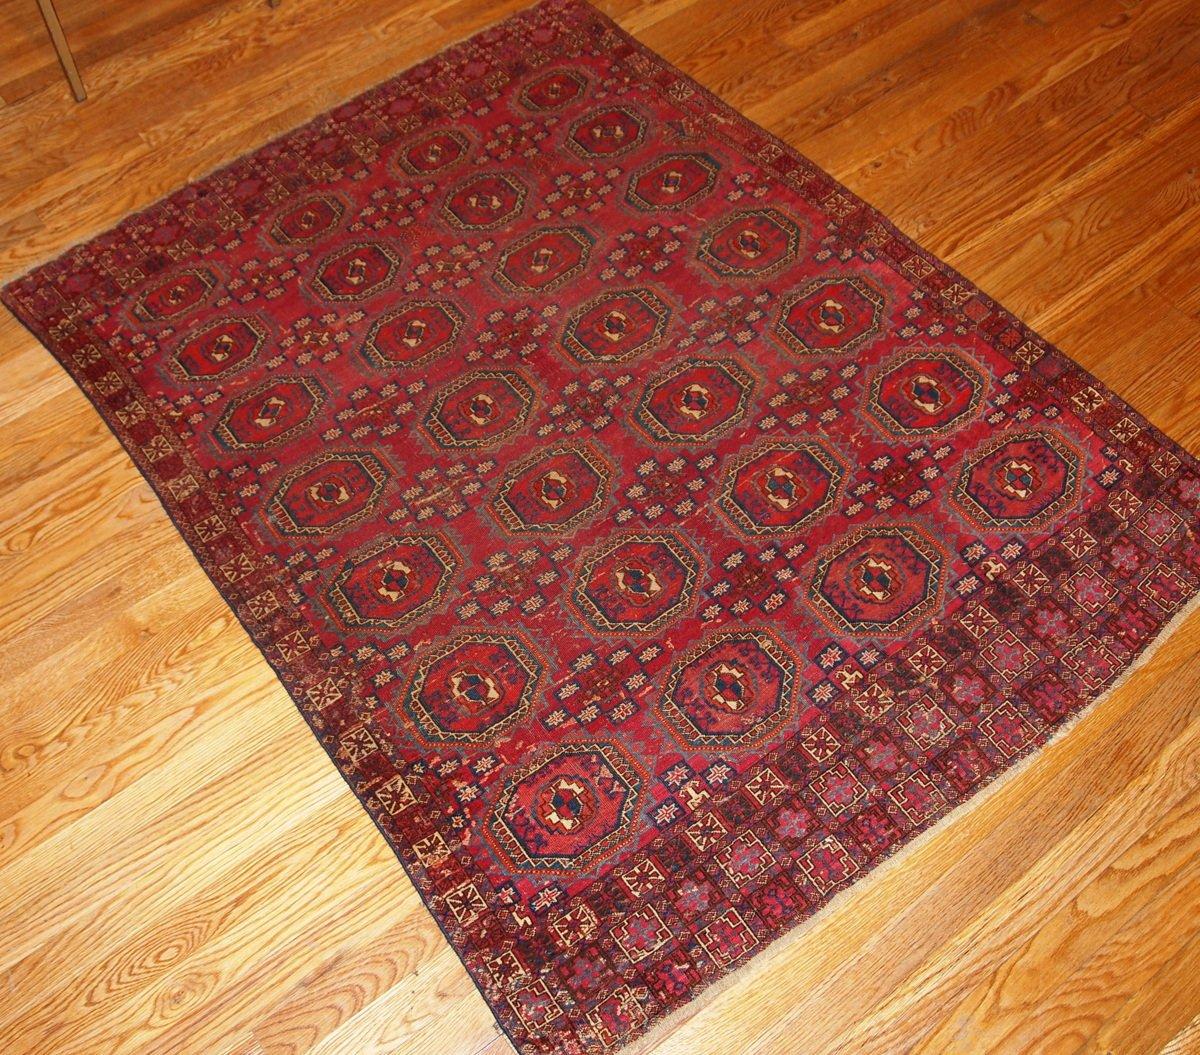 Antique Turkoman Rug: Antique Handmade Turkoman Saryk Rug, 1850s For Sale At Pamono